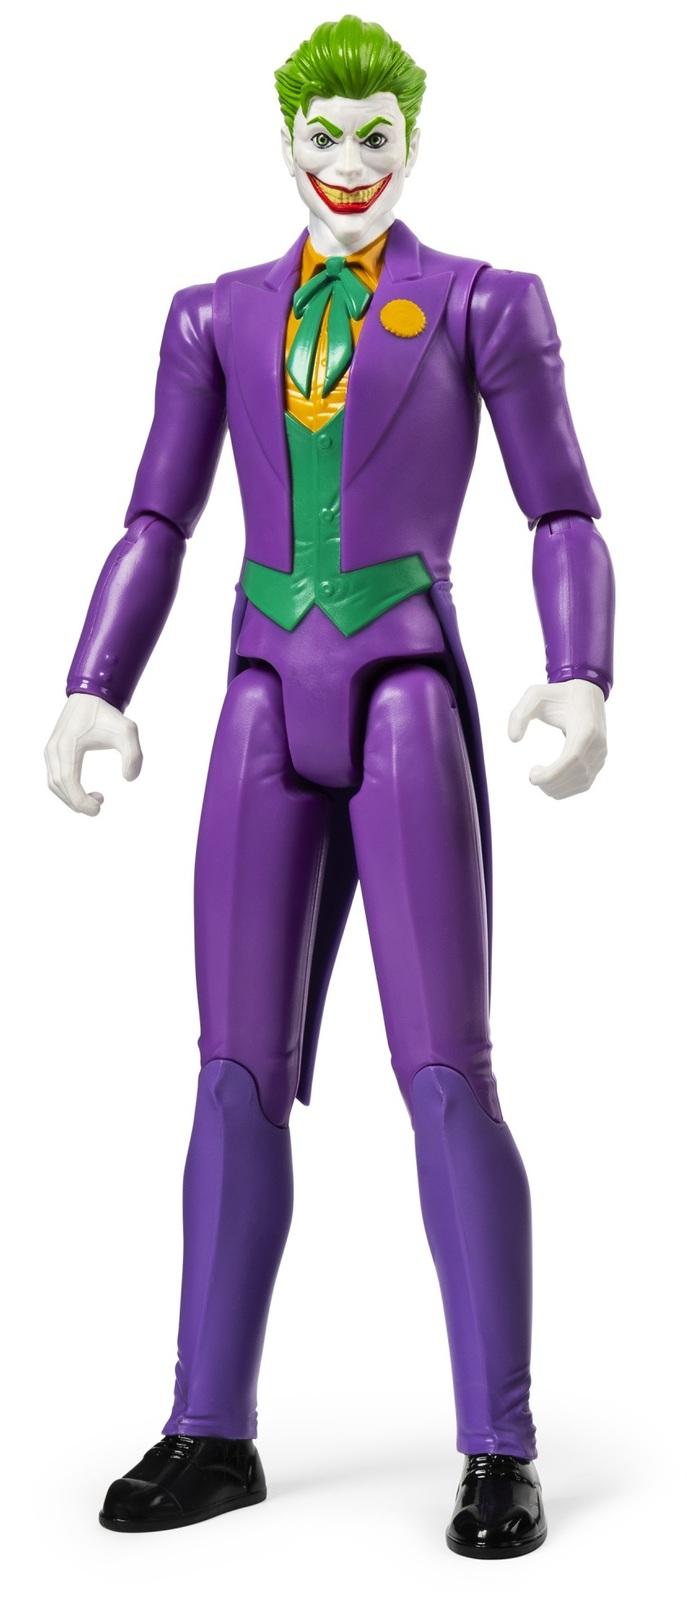 DC Comics: Joker - Large Action Figure image